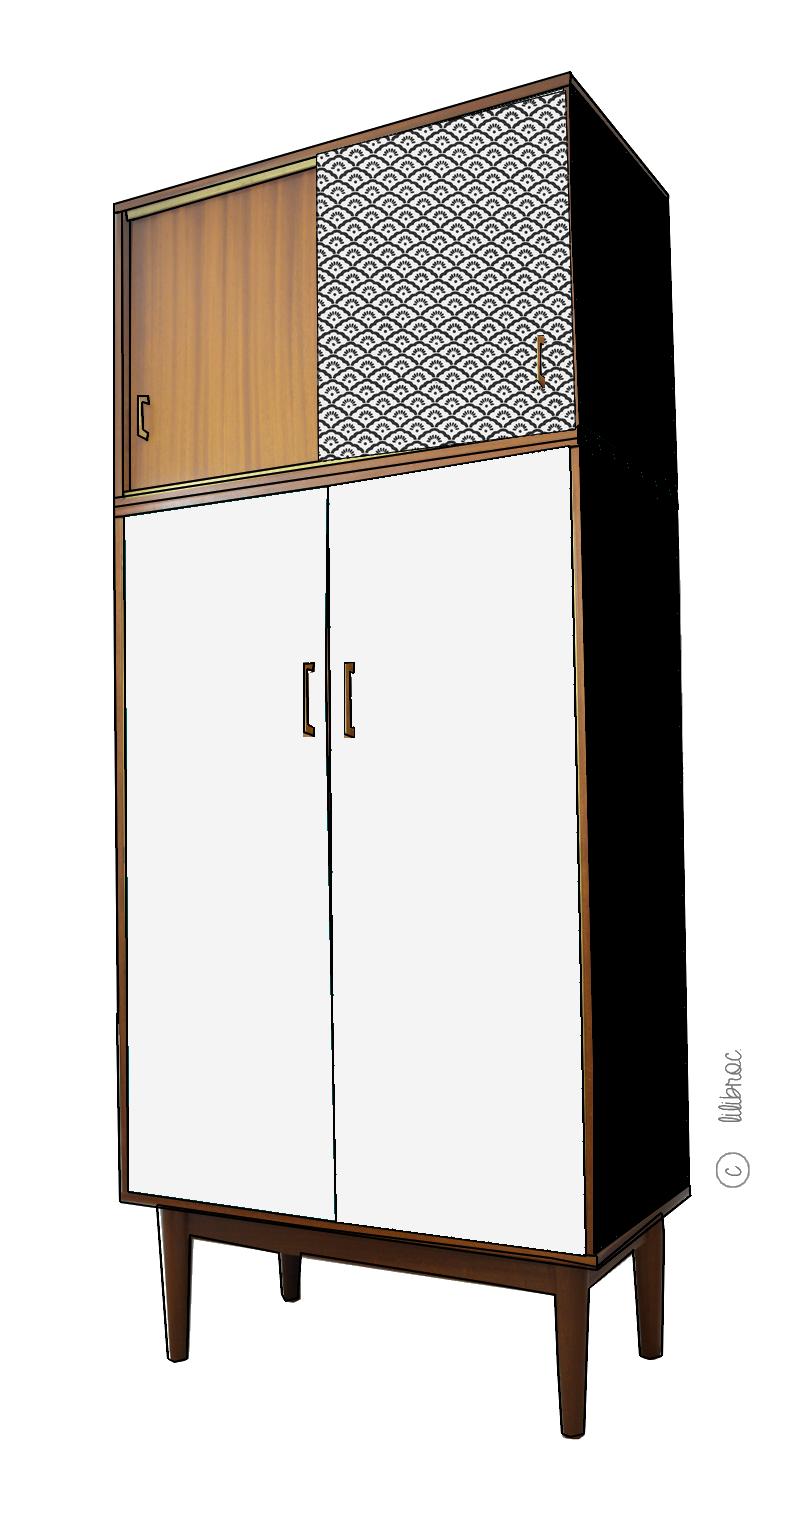 armoire-vintage-philomene-croquis-8